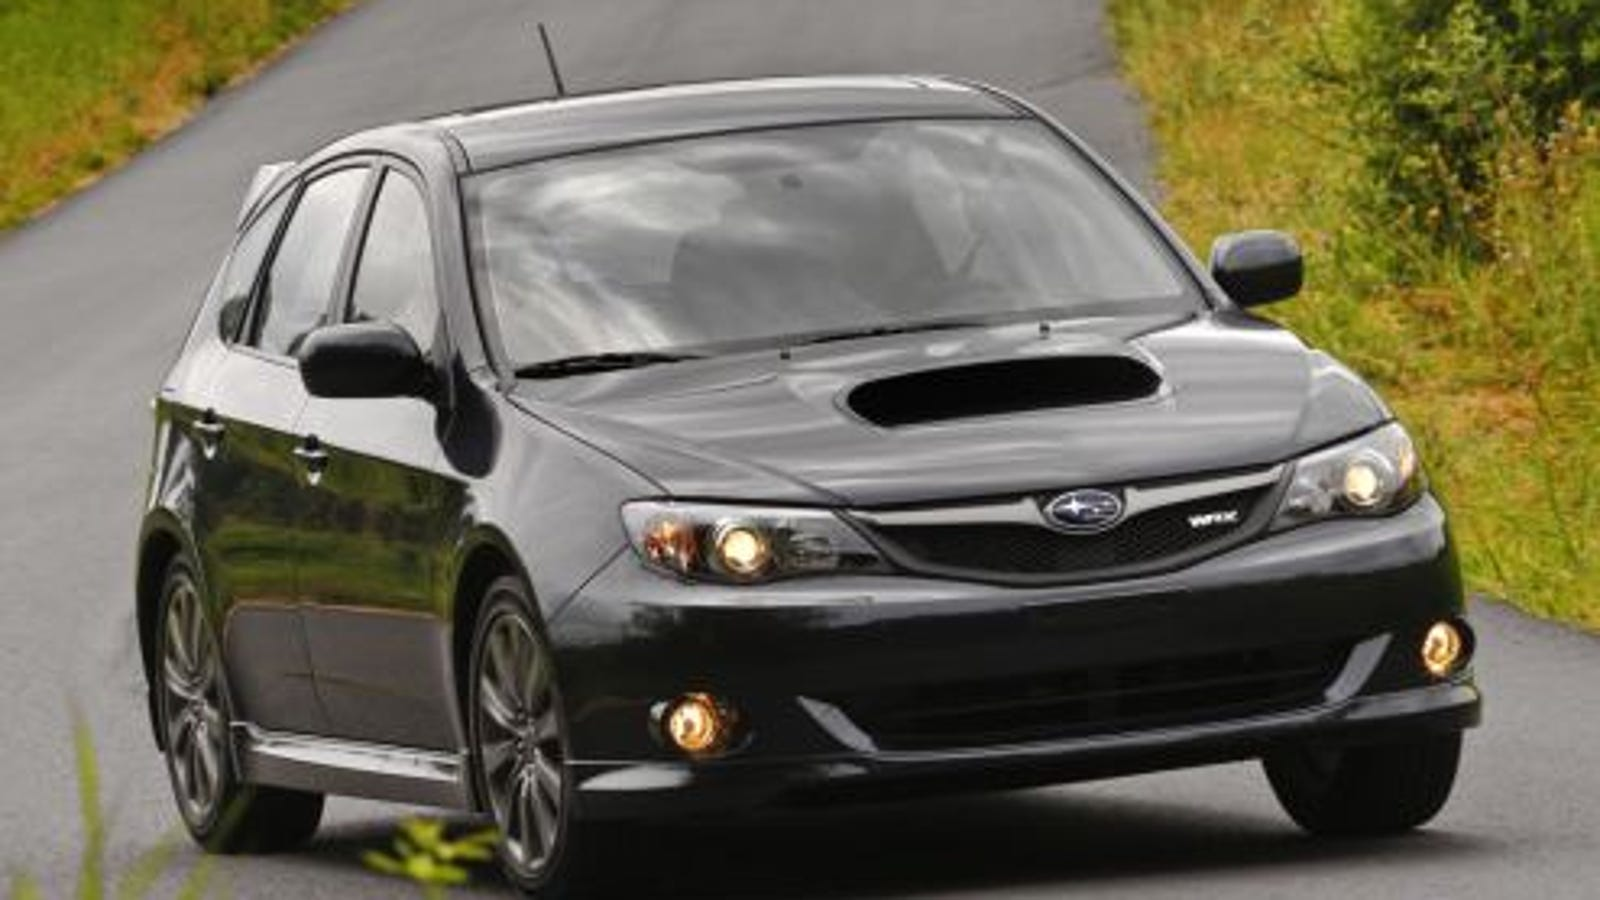 2009 Subaru Impreza Wrx A Taste Of Sti At 265 Hp Front Speaker Wiring Harness